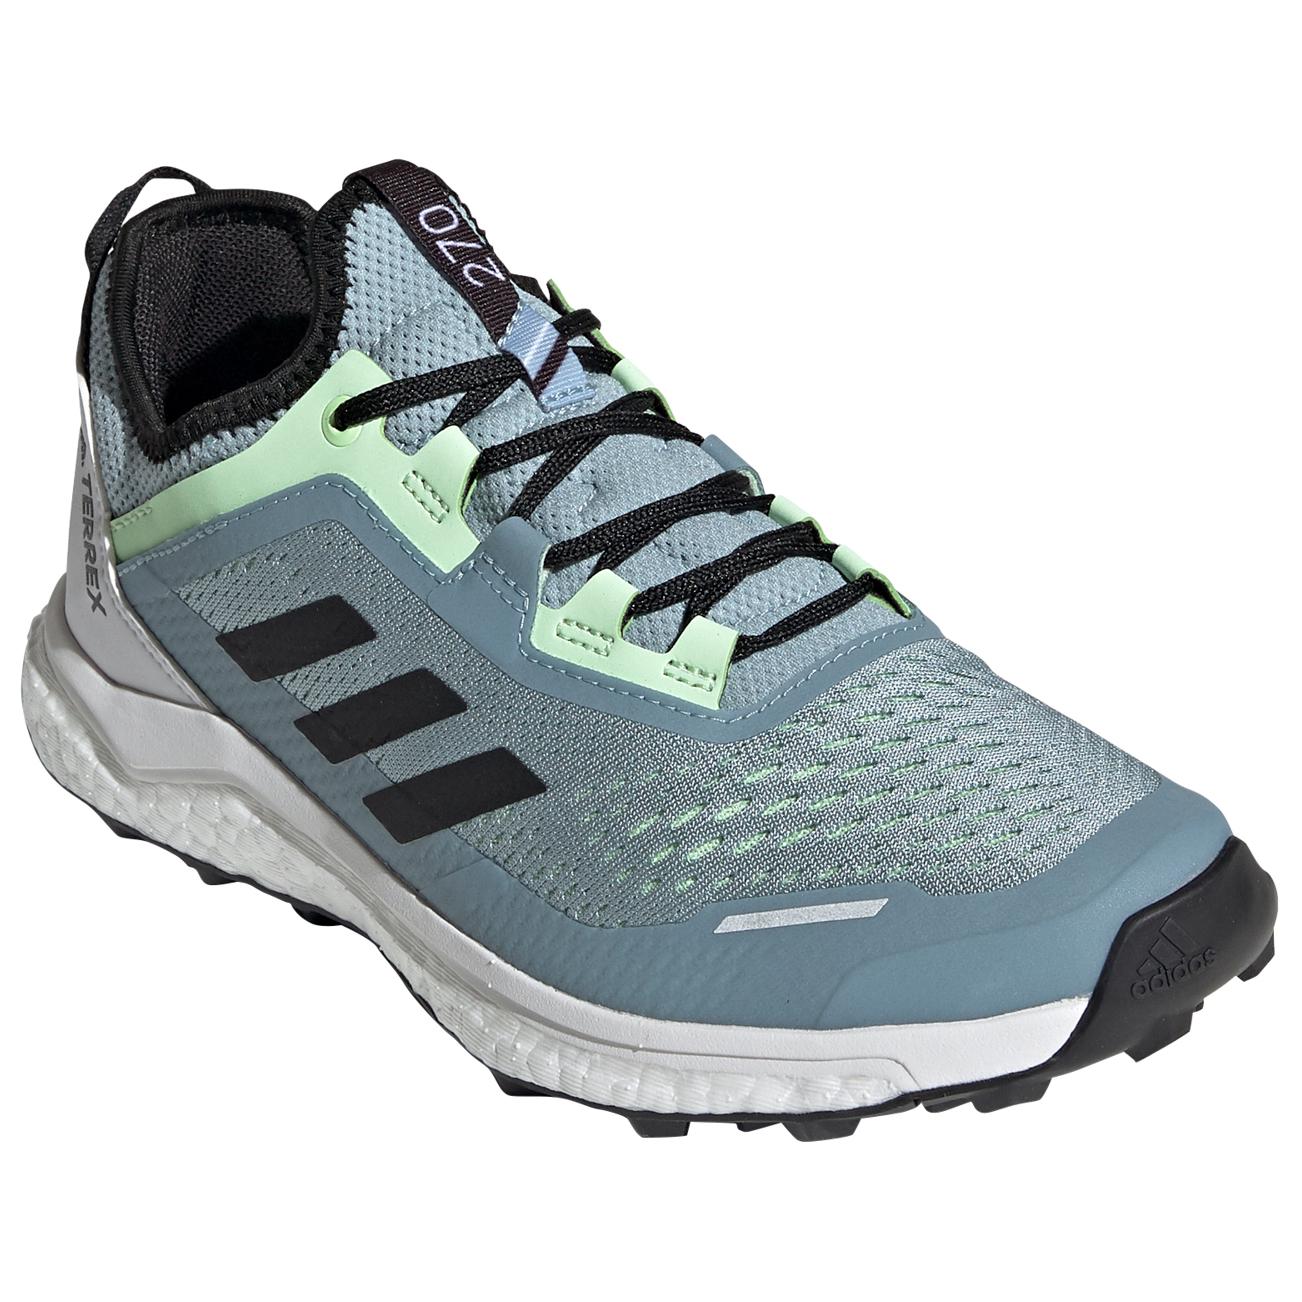 Trailrunningschuhe Terrex Adidas Flow Agravic Damen mw0N8vnOy